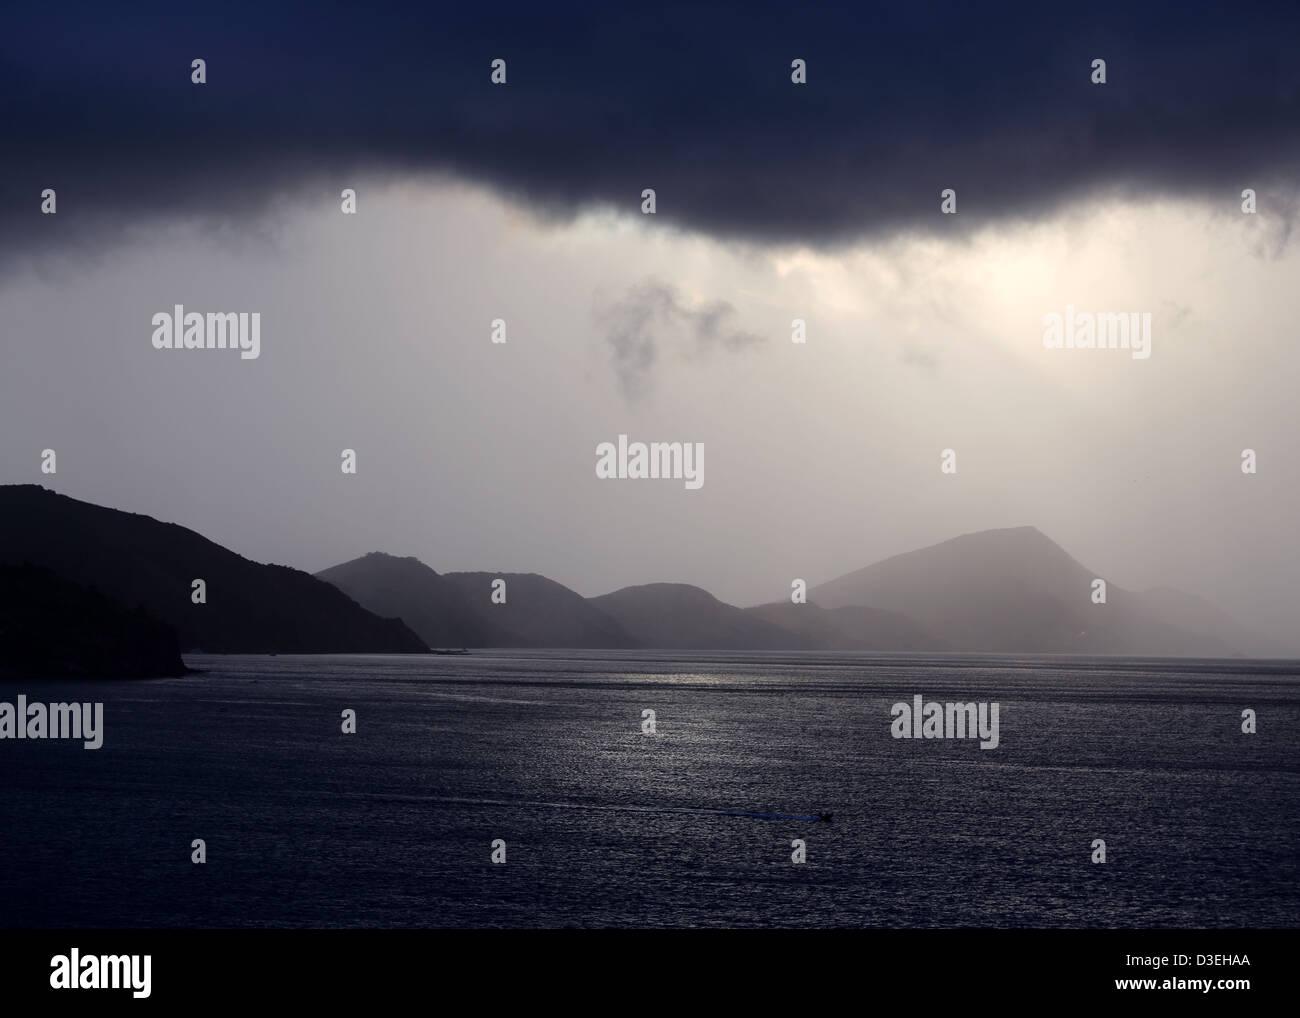 CARIBBEAN DAWN TROPICAL RAINSTORM - Stock Image